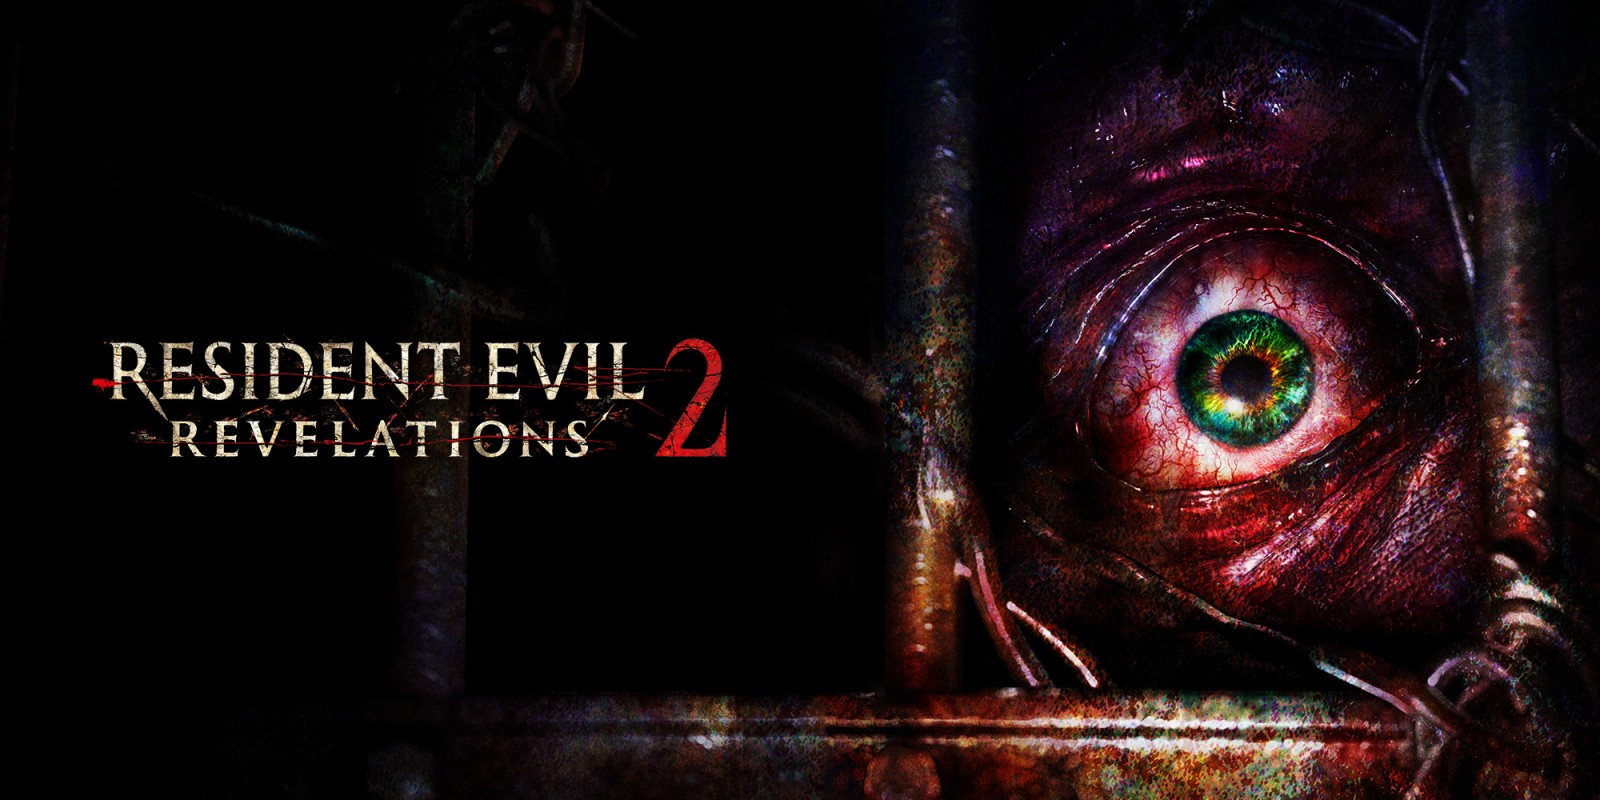 TOP 10 Resident Evil favoritos